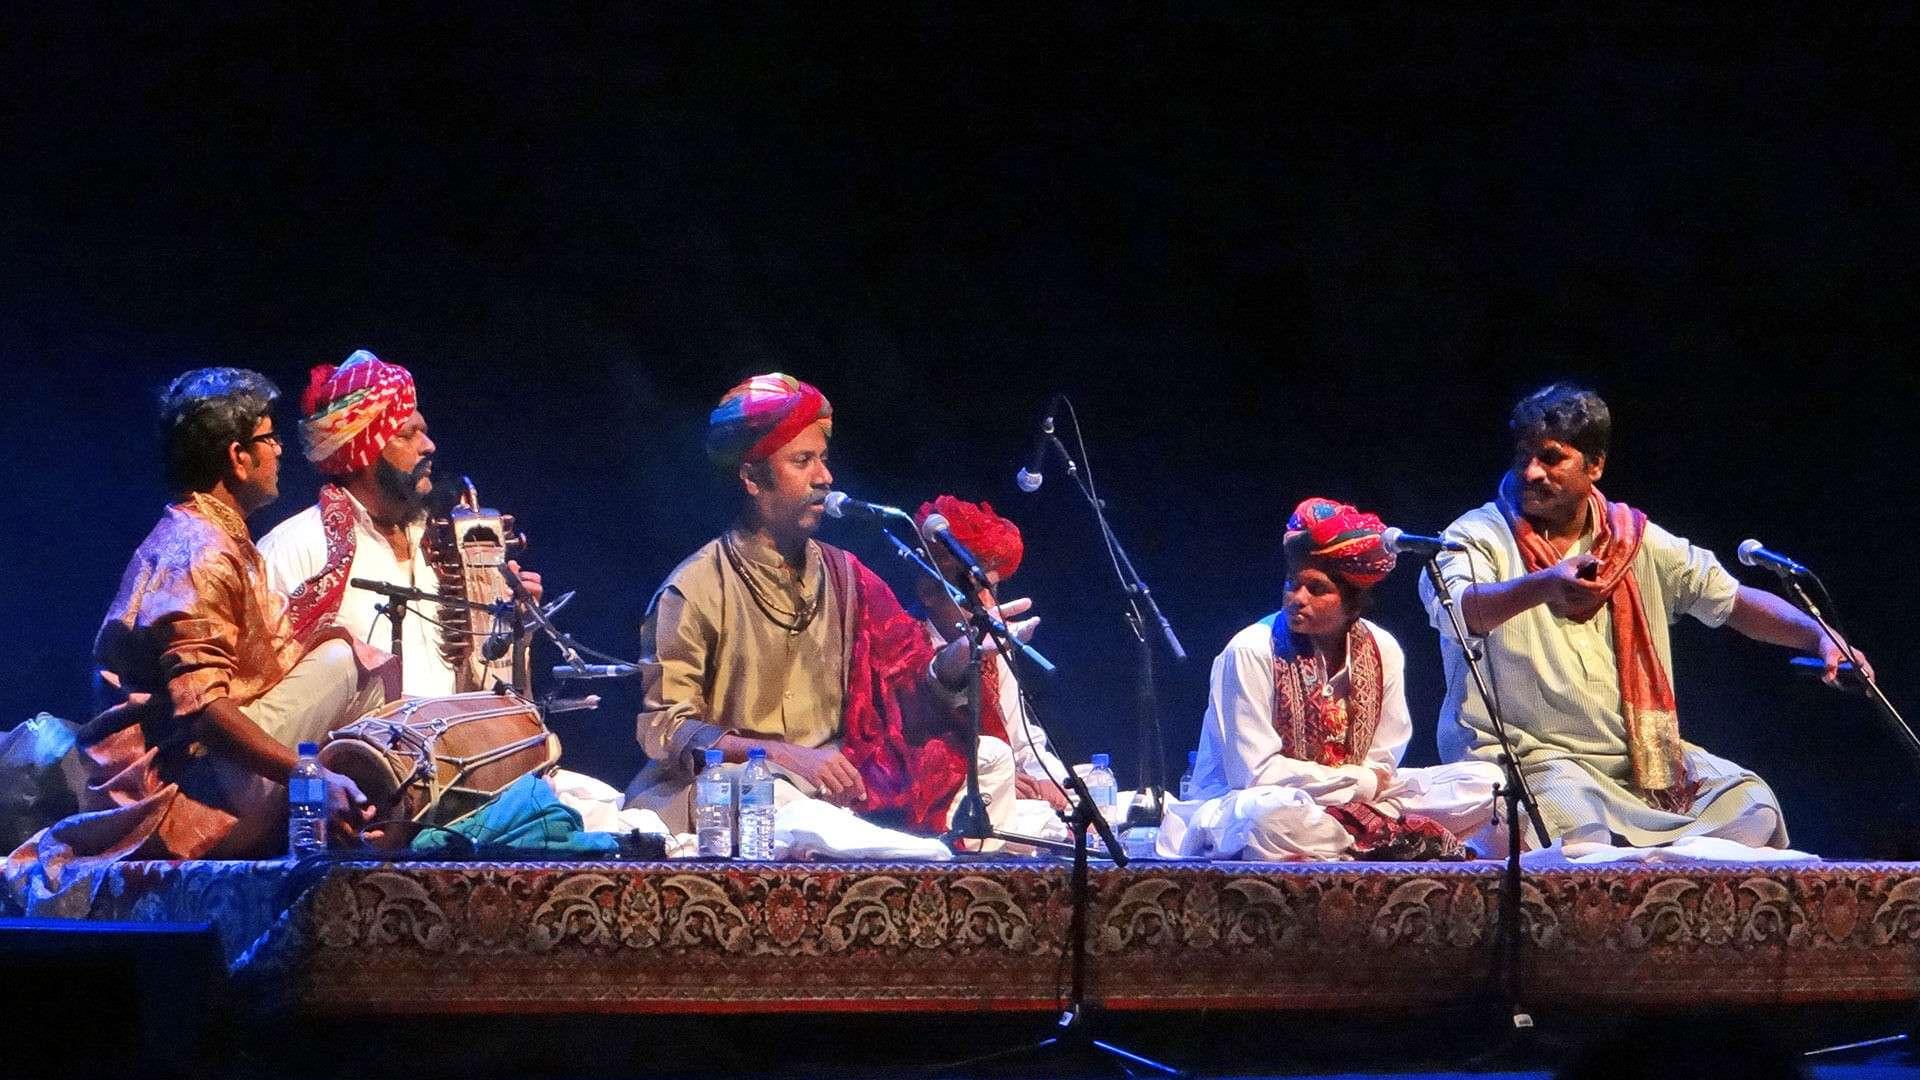 Jodhpur_RiffFestival_Attractions